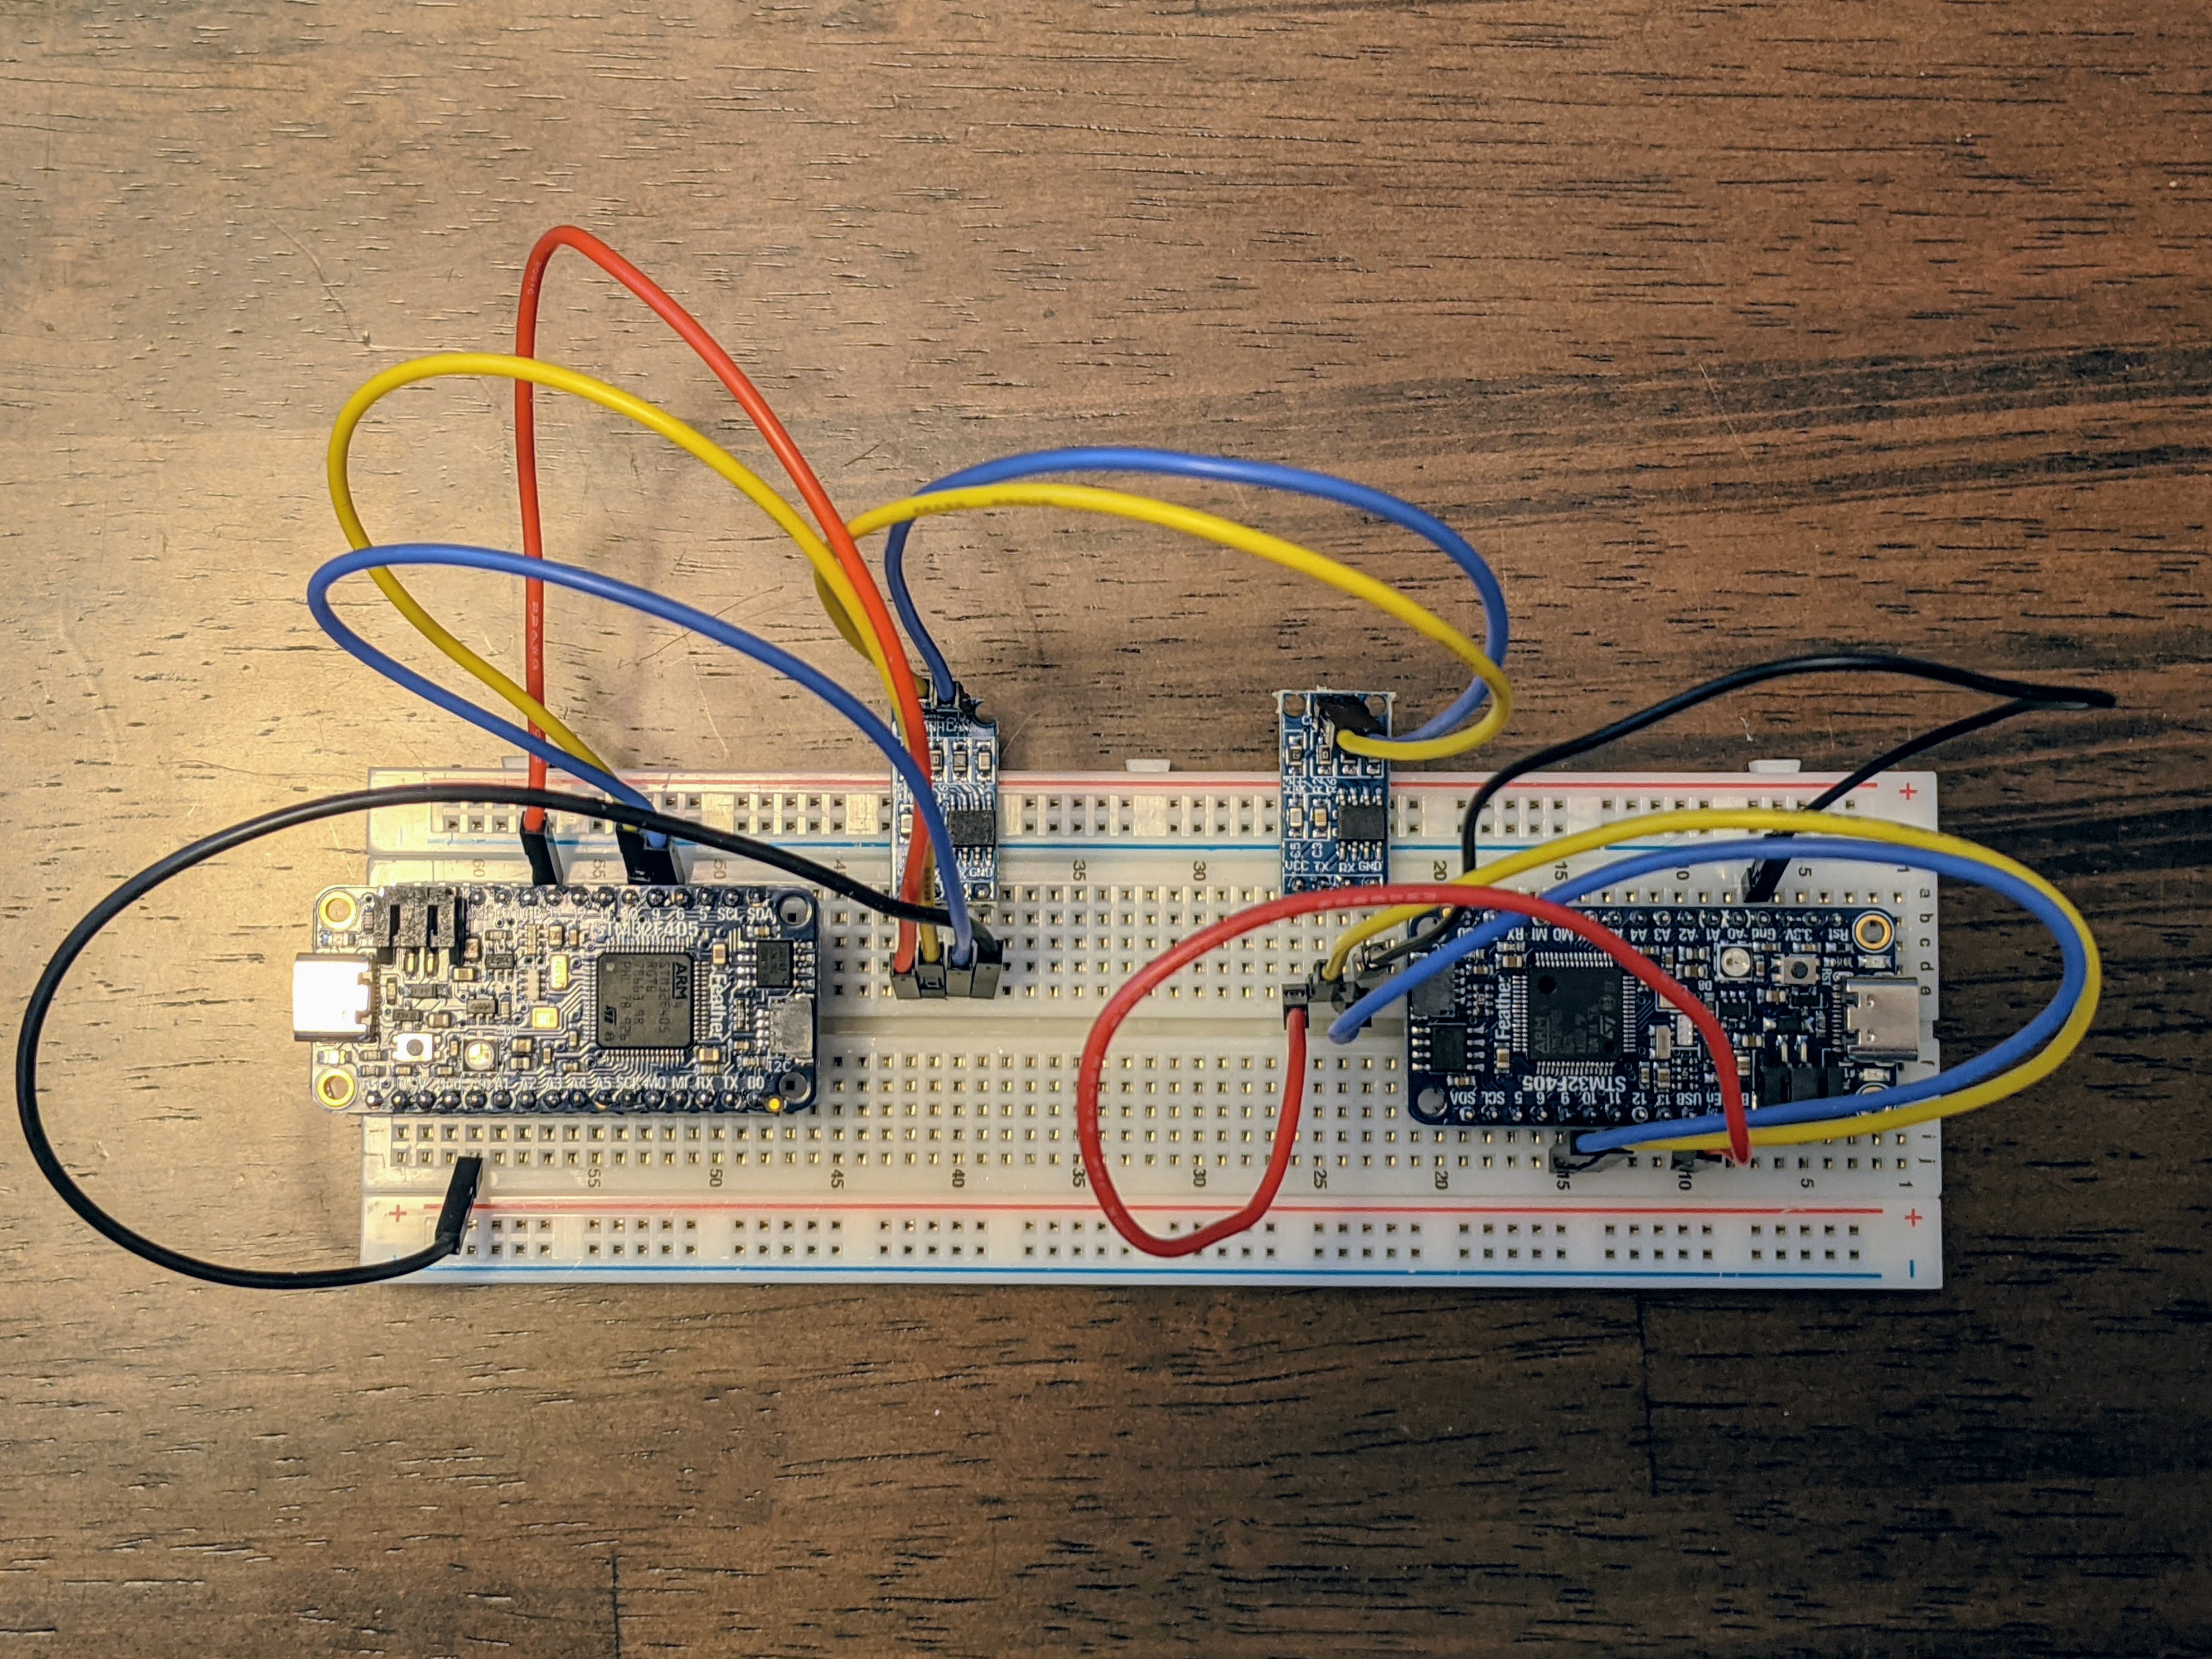 circuitpython_PXL_20201106_145653558.jpg